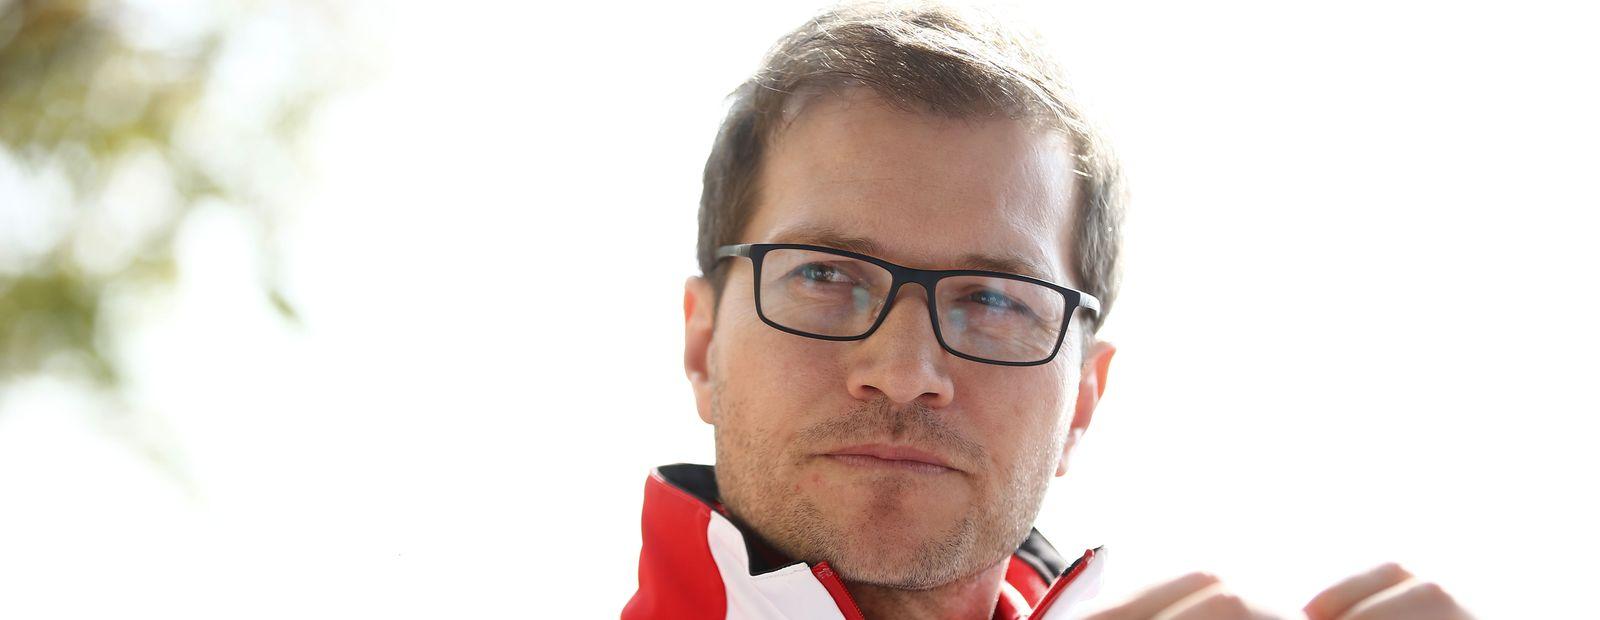 McLaren Racing confirms start date for Andreas Seidl